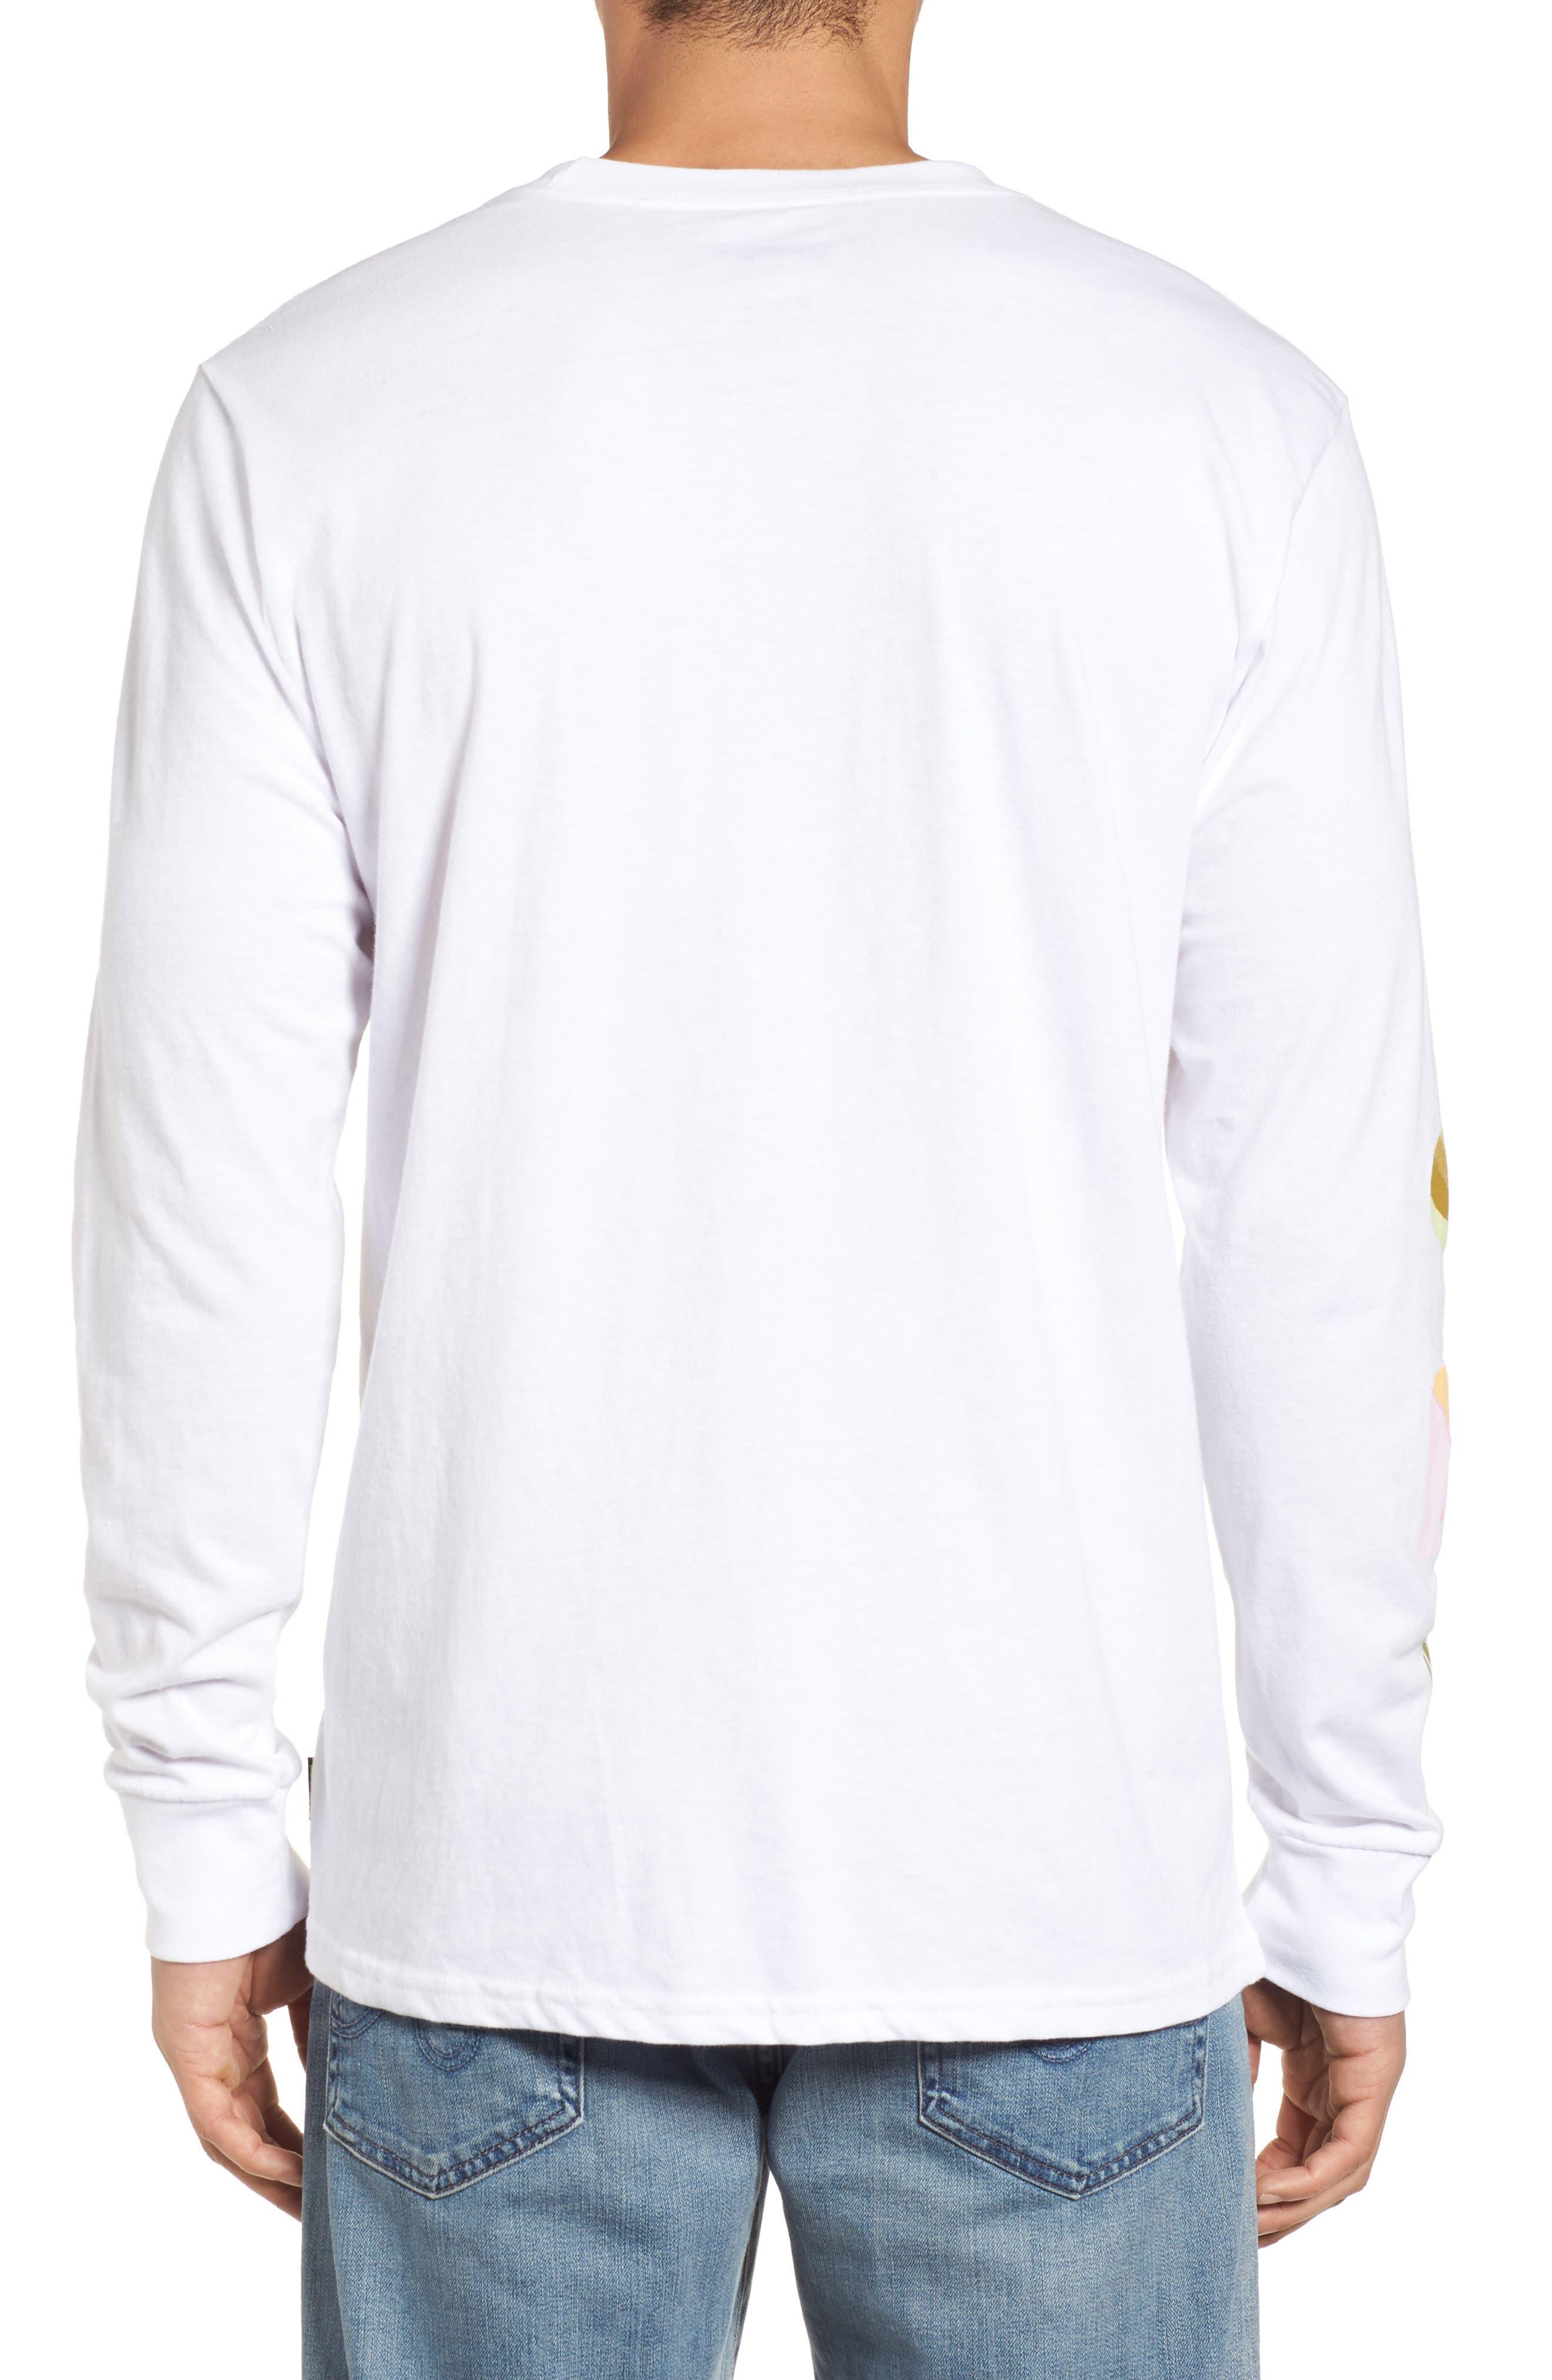 Wandering Eye Embroidered Long Sleeve T-Shirt,                             Alternate thumbnail 2, color,                             White